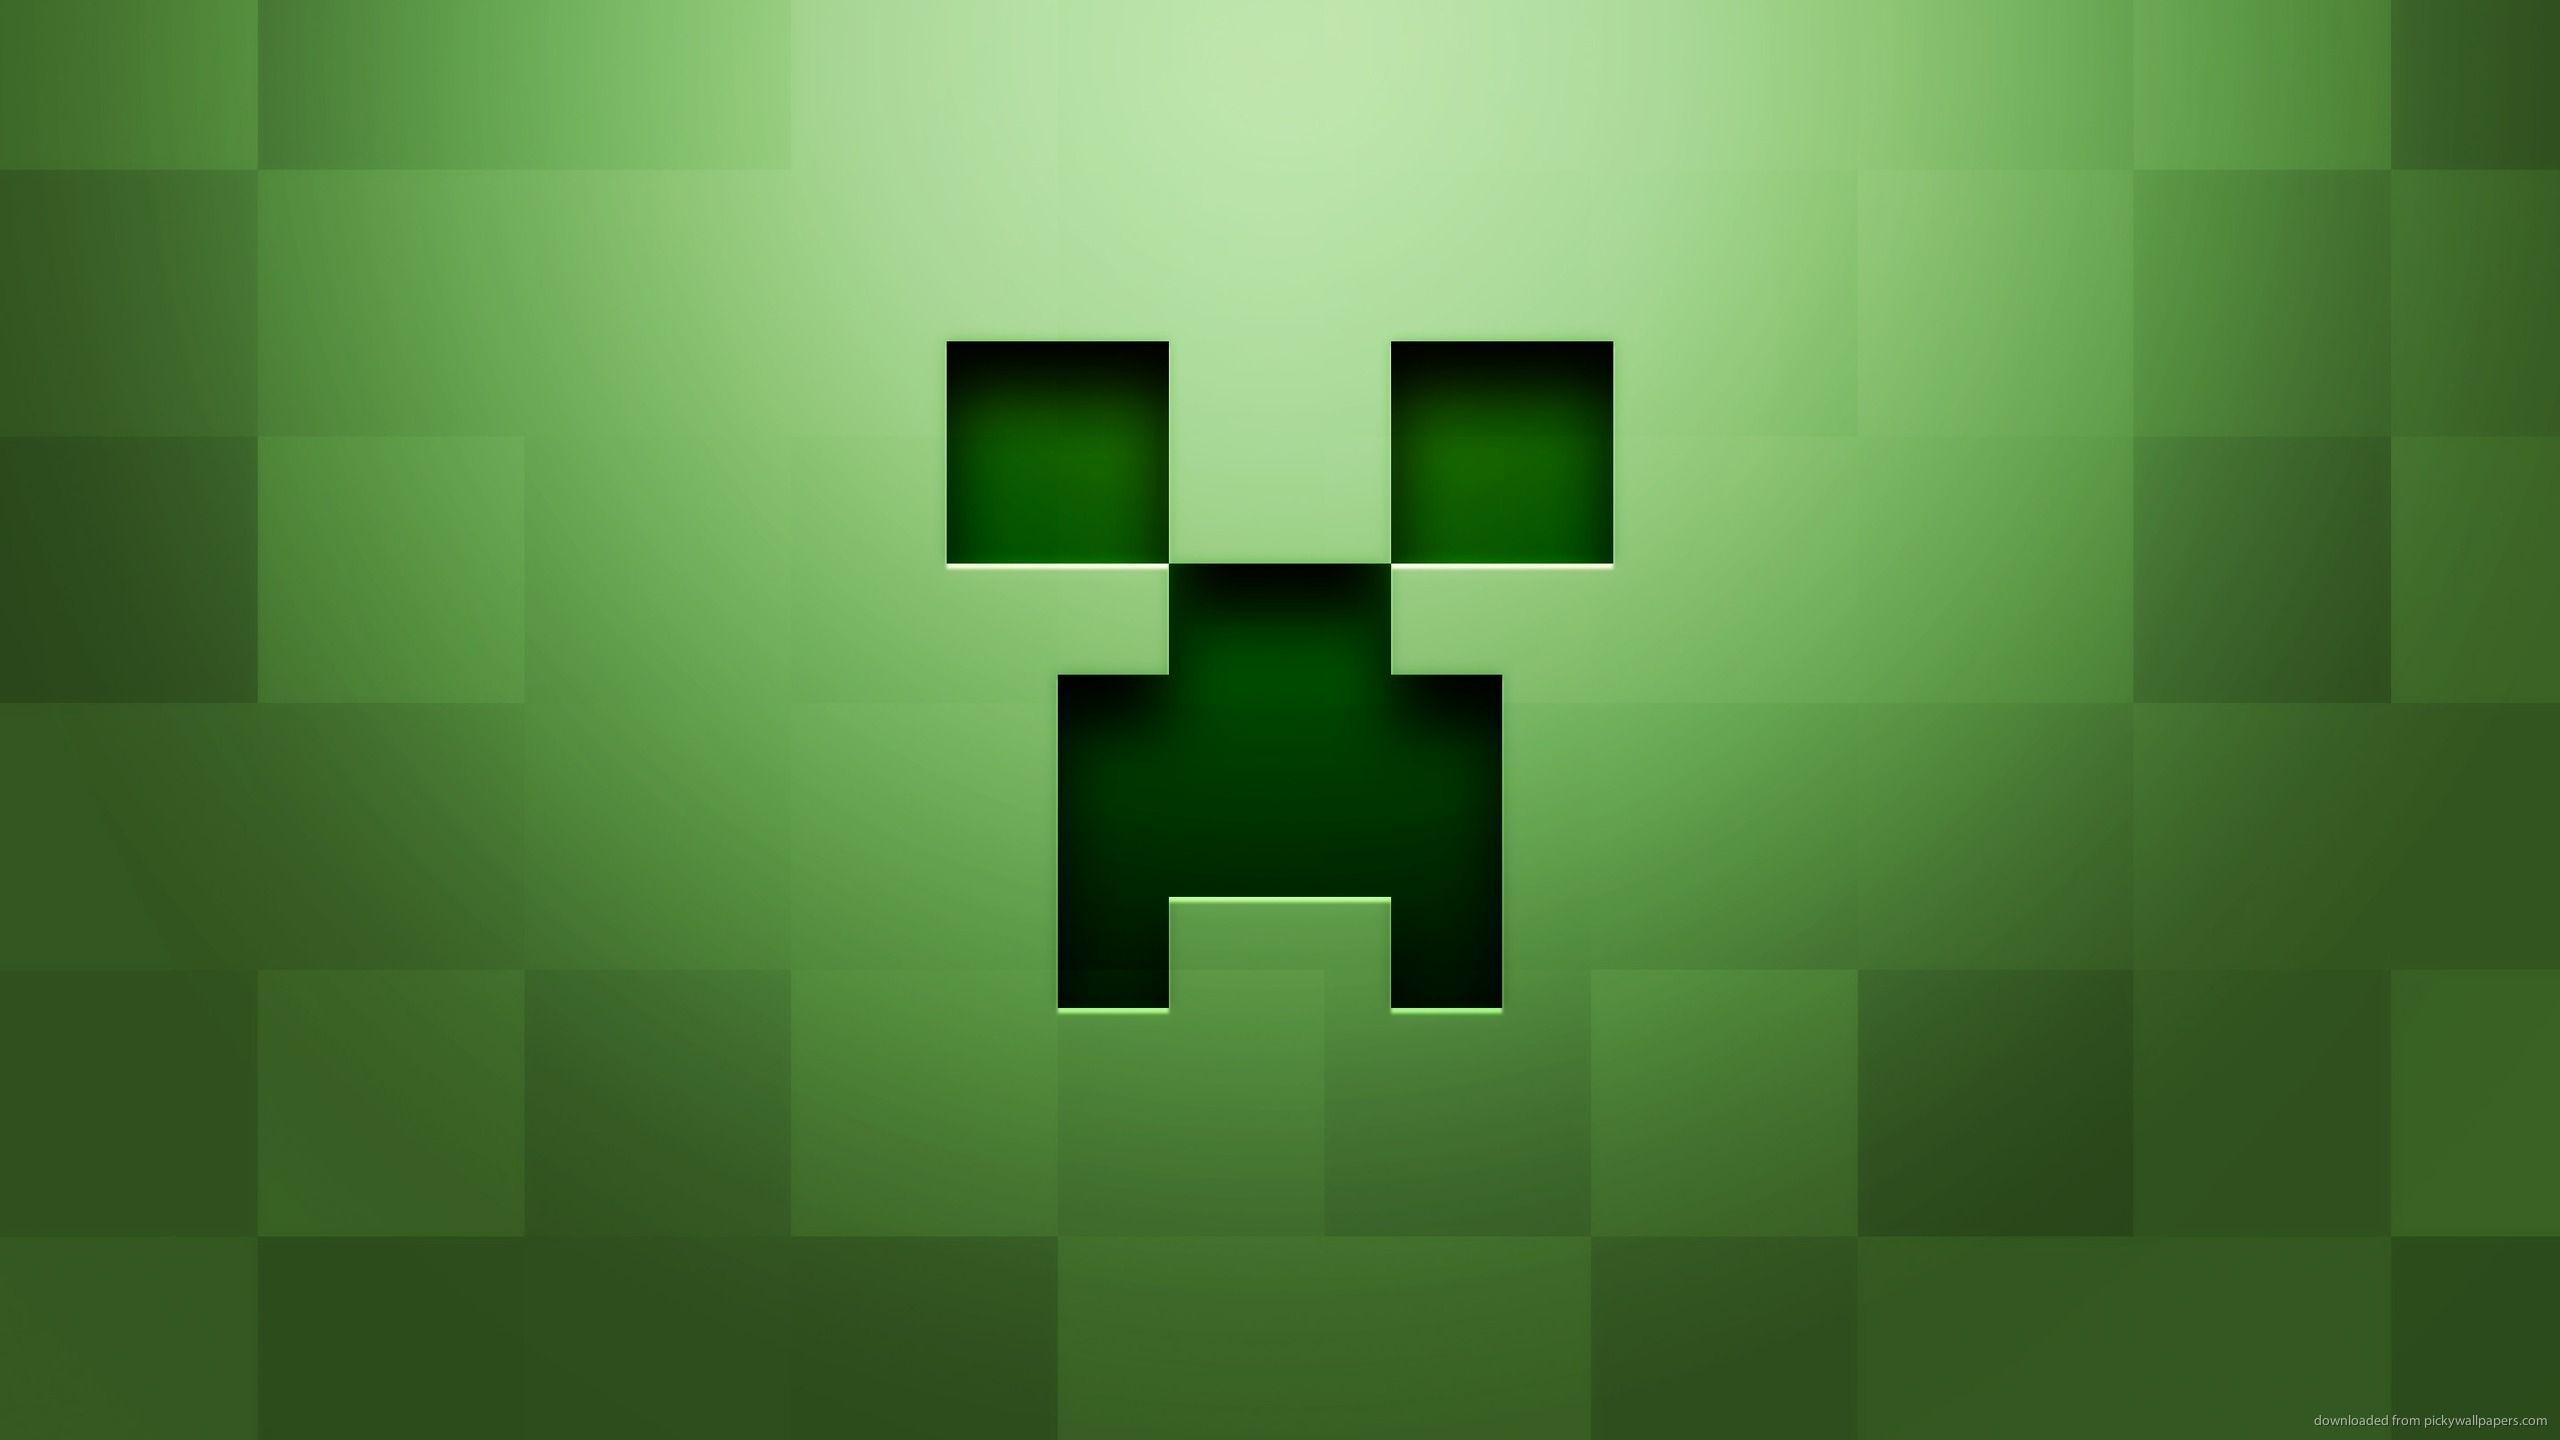 2560x1440 Minecraft Wallpapers Top Free 2560x1440 Minecraft